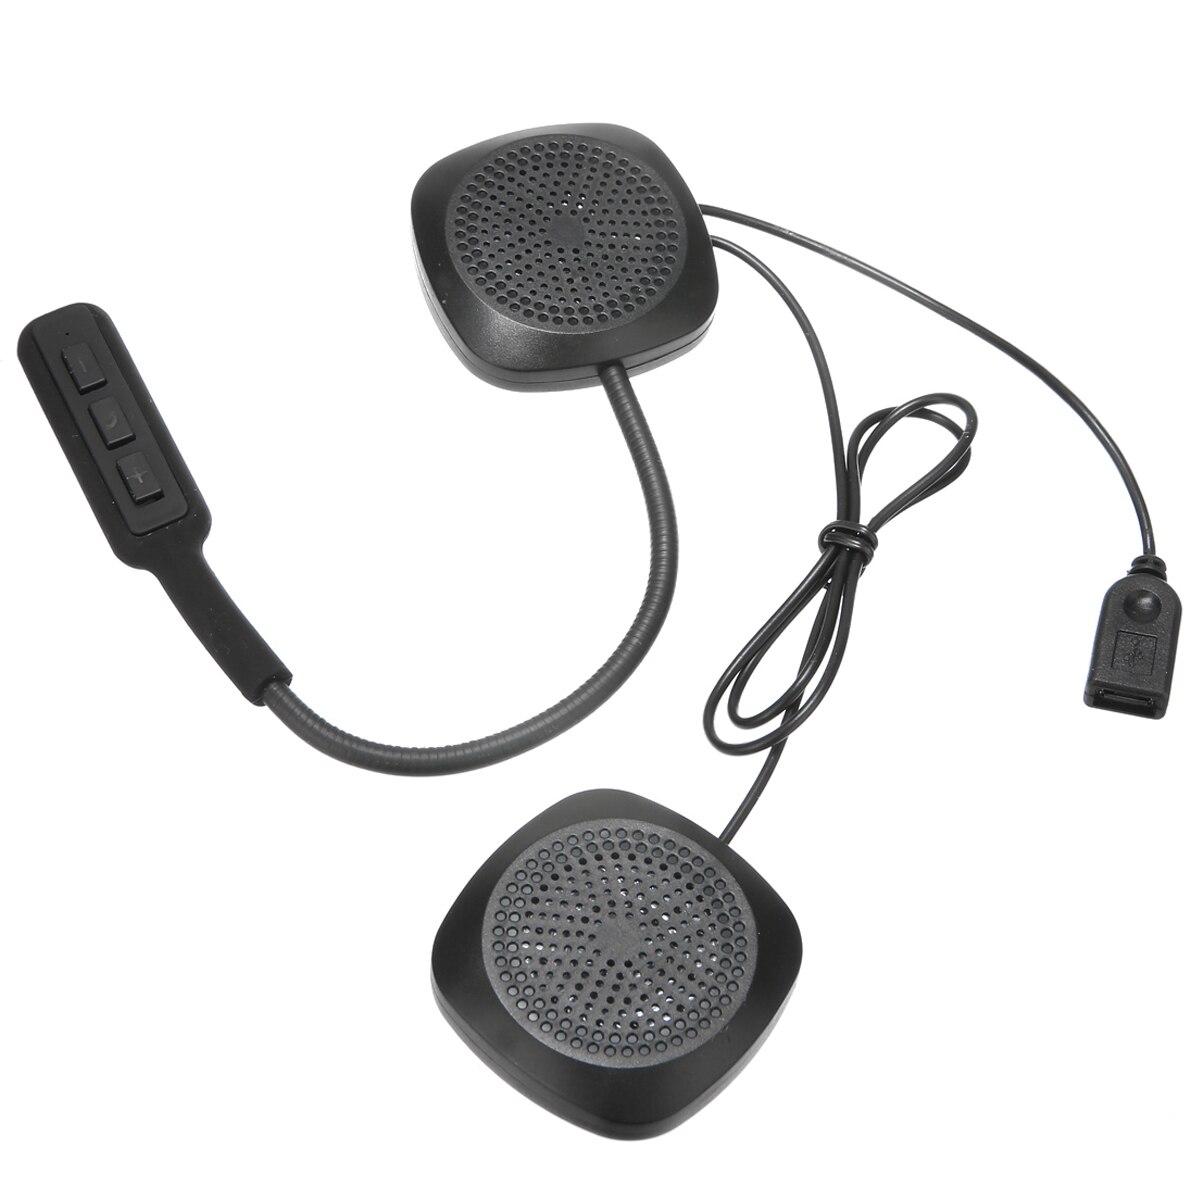 Universal 1set DC5V Motorbike Bluetooth Headset Motorcycle Helmet Hands Free Headphones For Music GPS Car Styling Tool